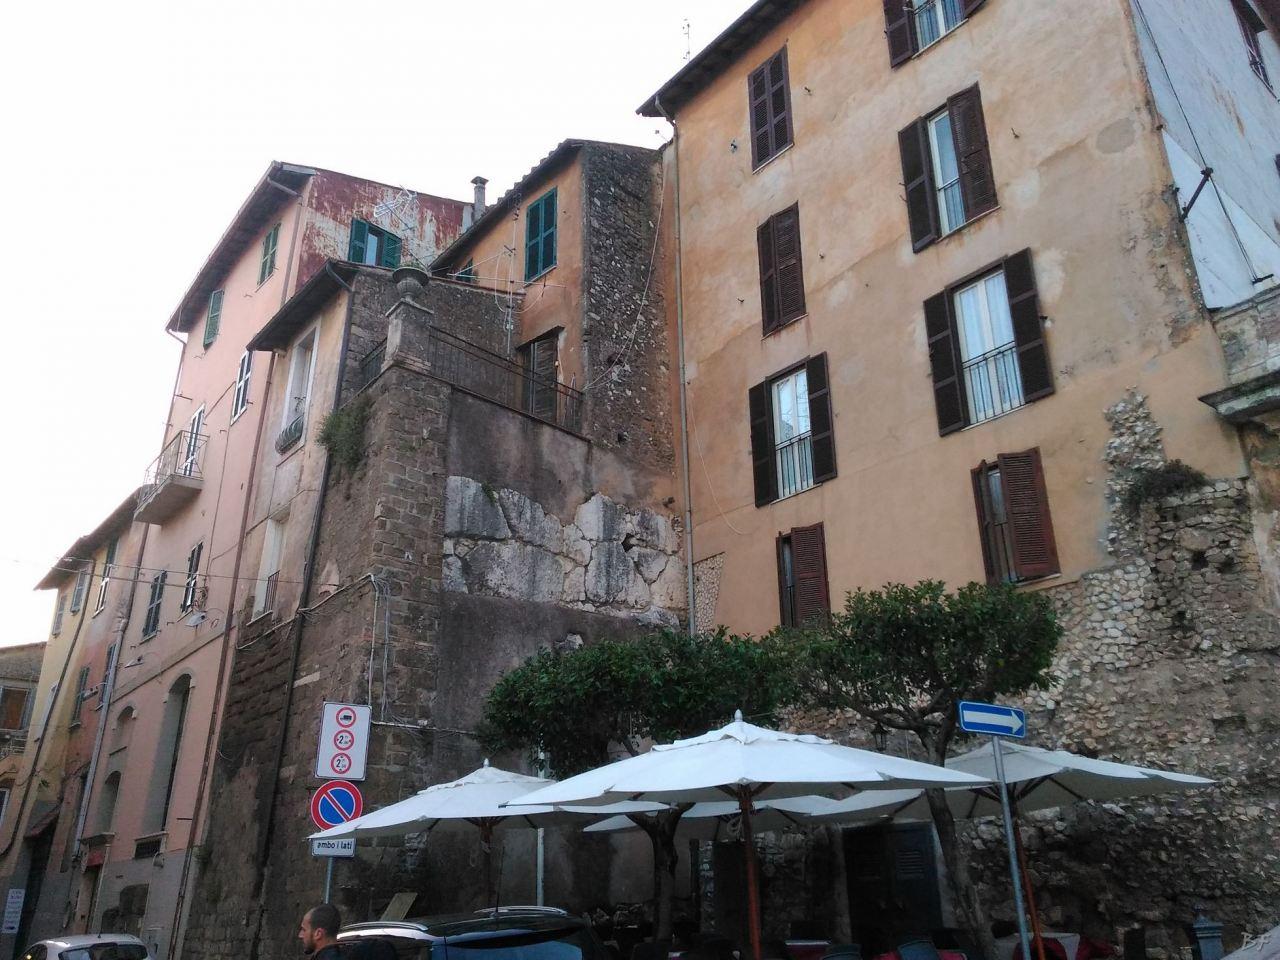 Praeneste-Mura-Poligonali-Megalitiche-Palestrina-Castel-San-Pietro-Roma-Lazio-Italia-3